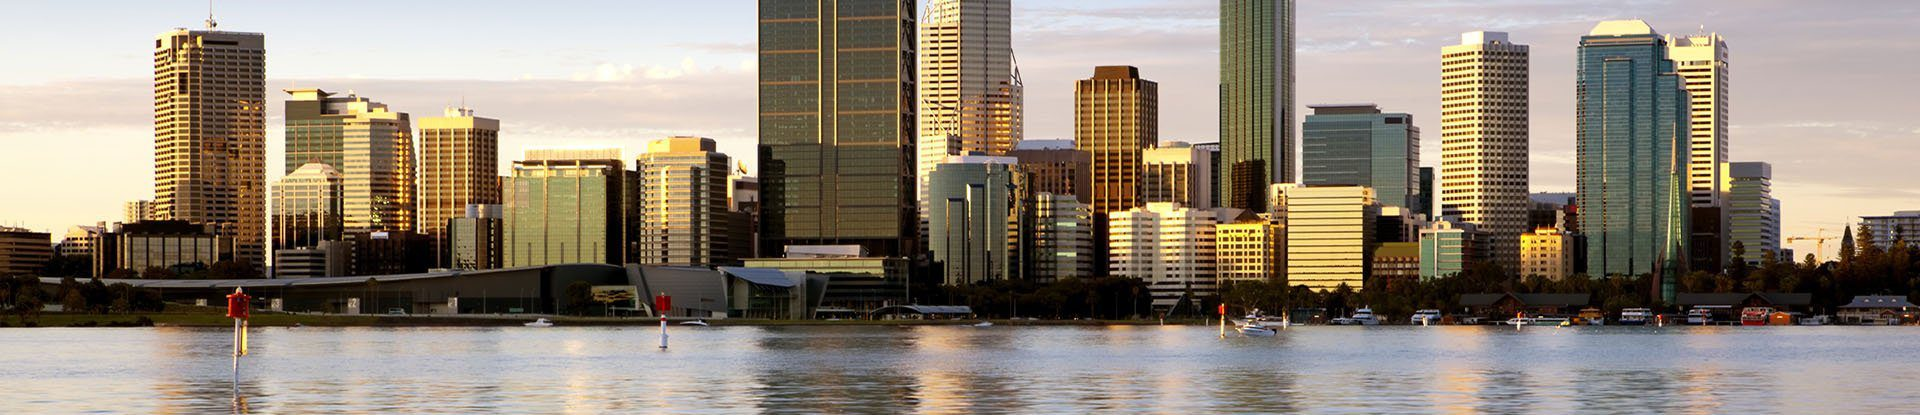 Perth banner 2